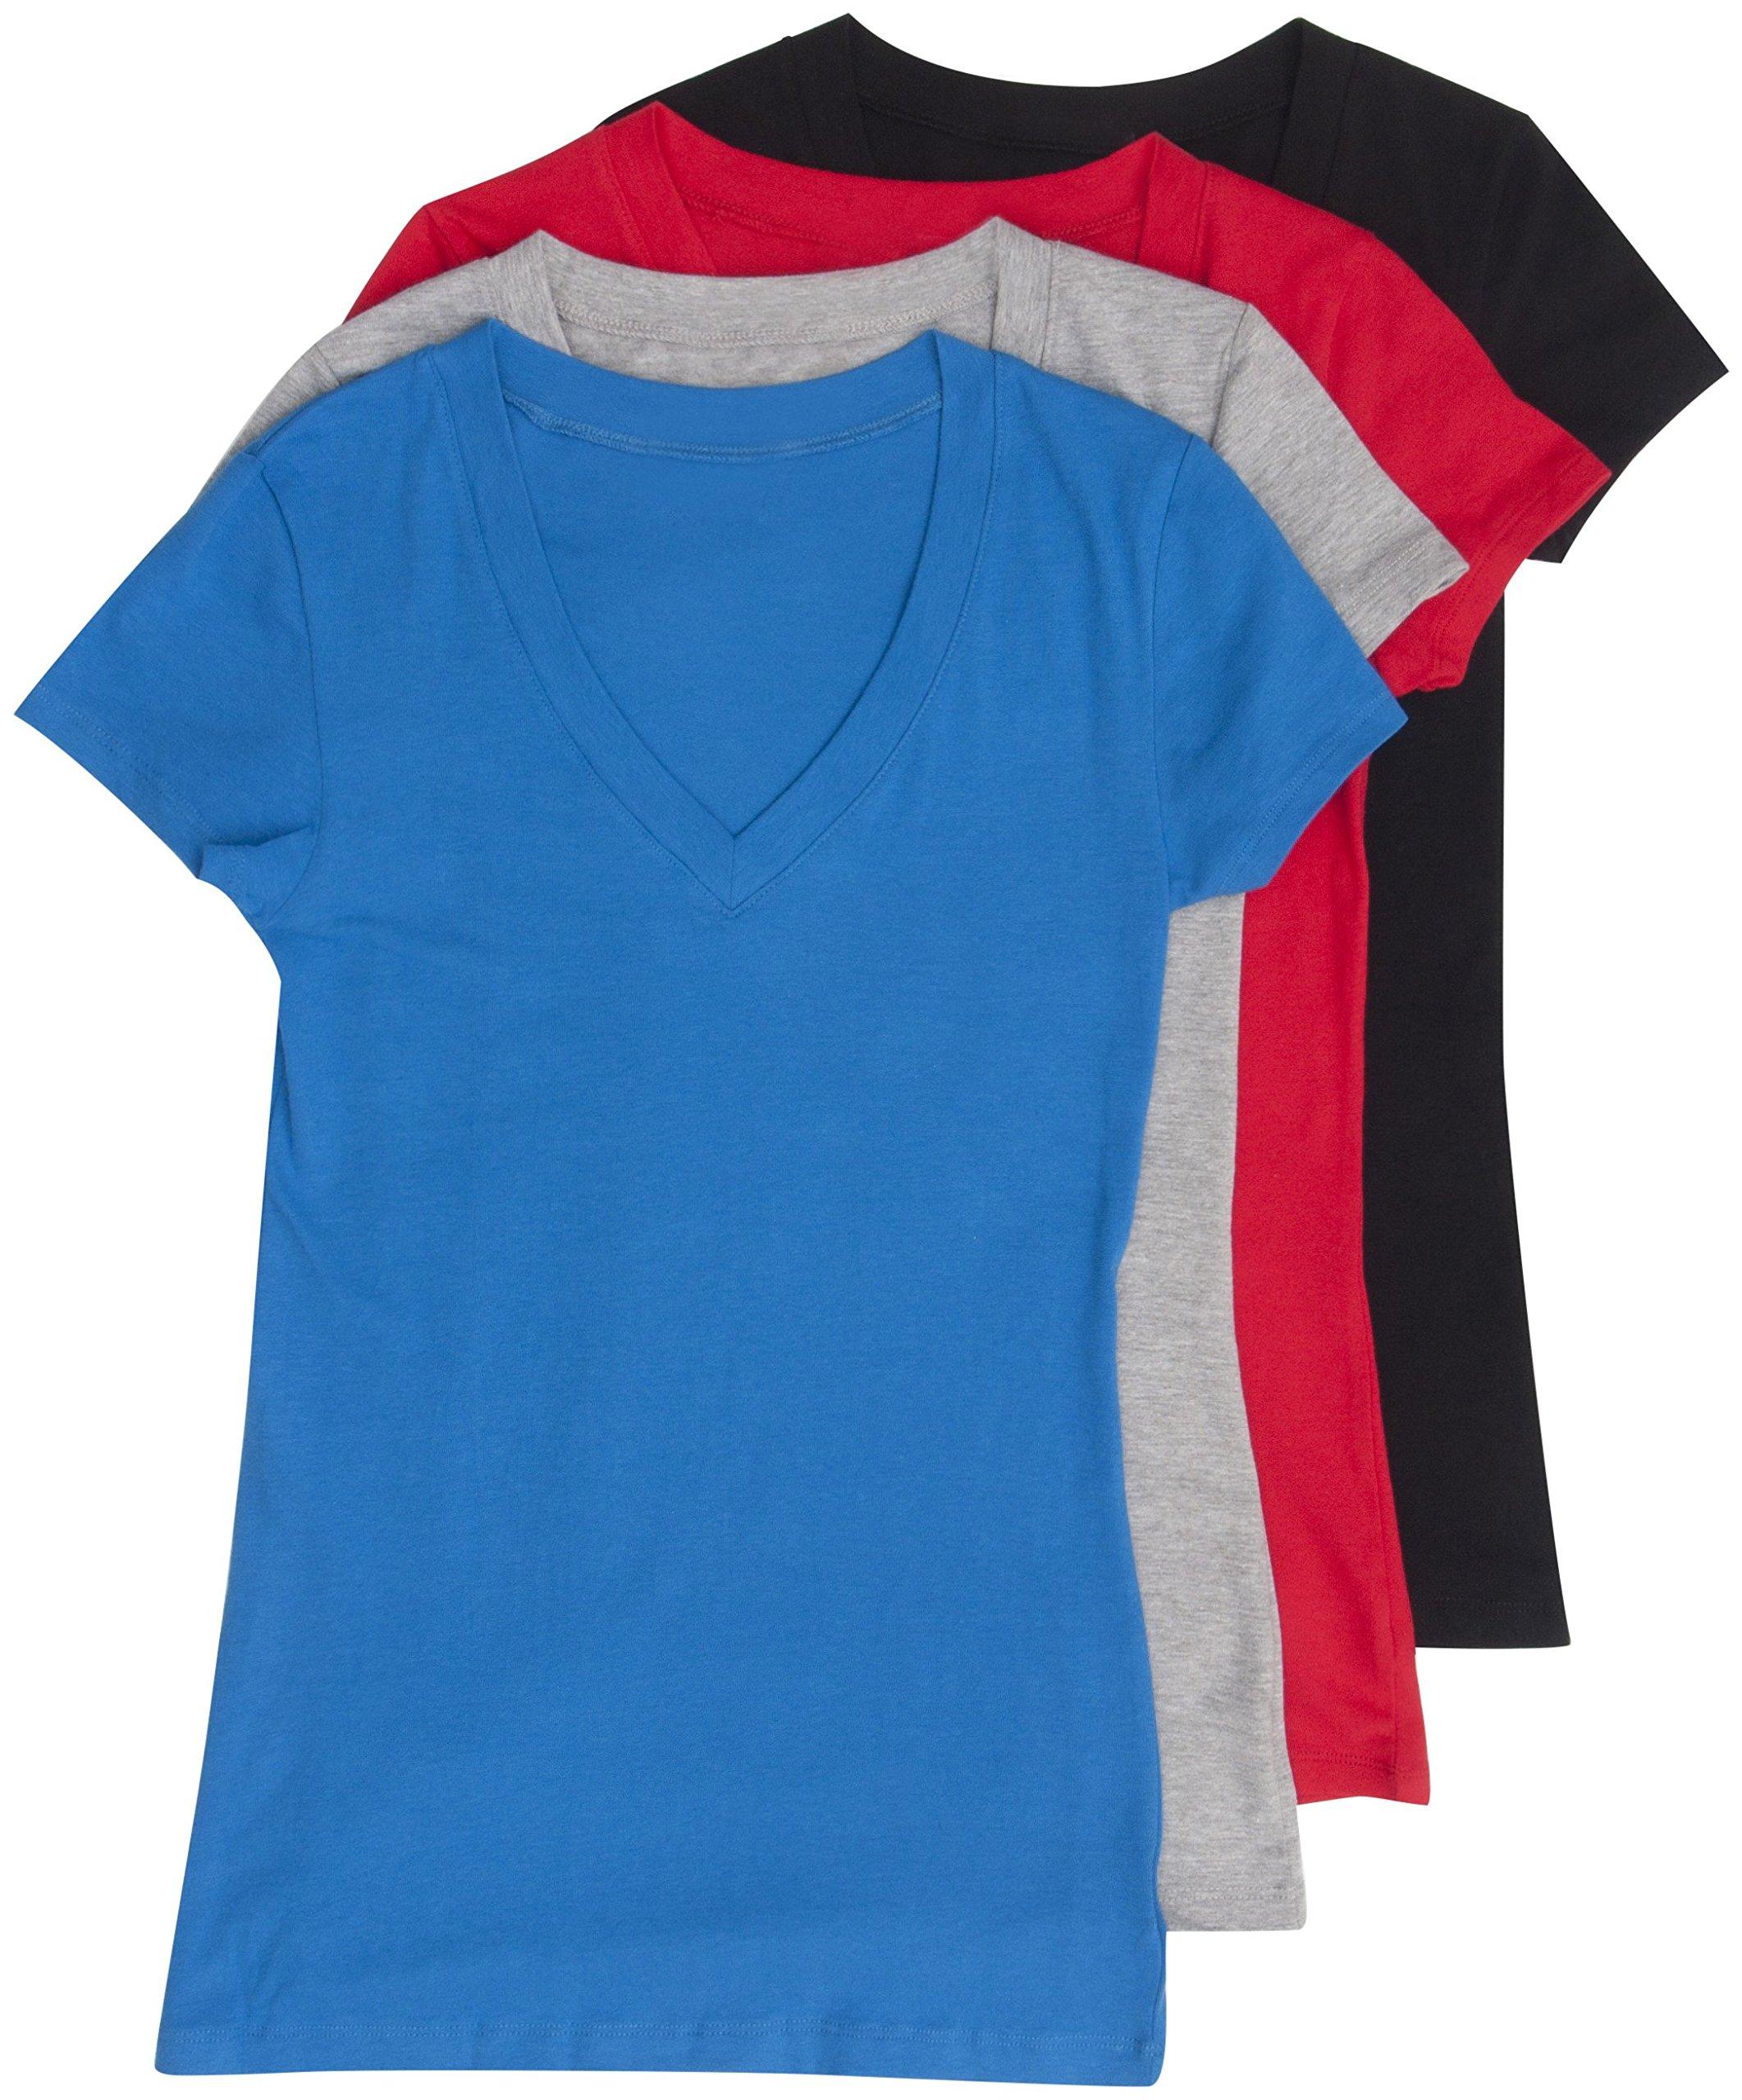 31a192317 Galleon - 4 Pack Zenana Women's Basic V-Neck T-Shirts Med Black, H Gray,  Red, B Blue